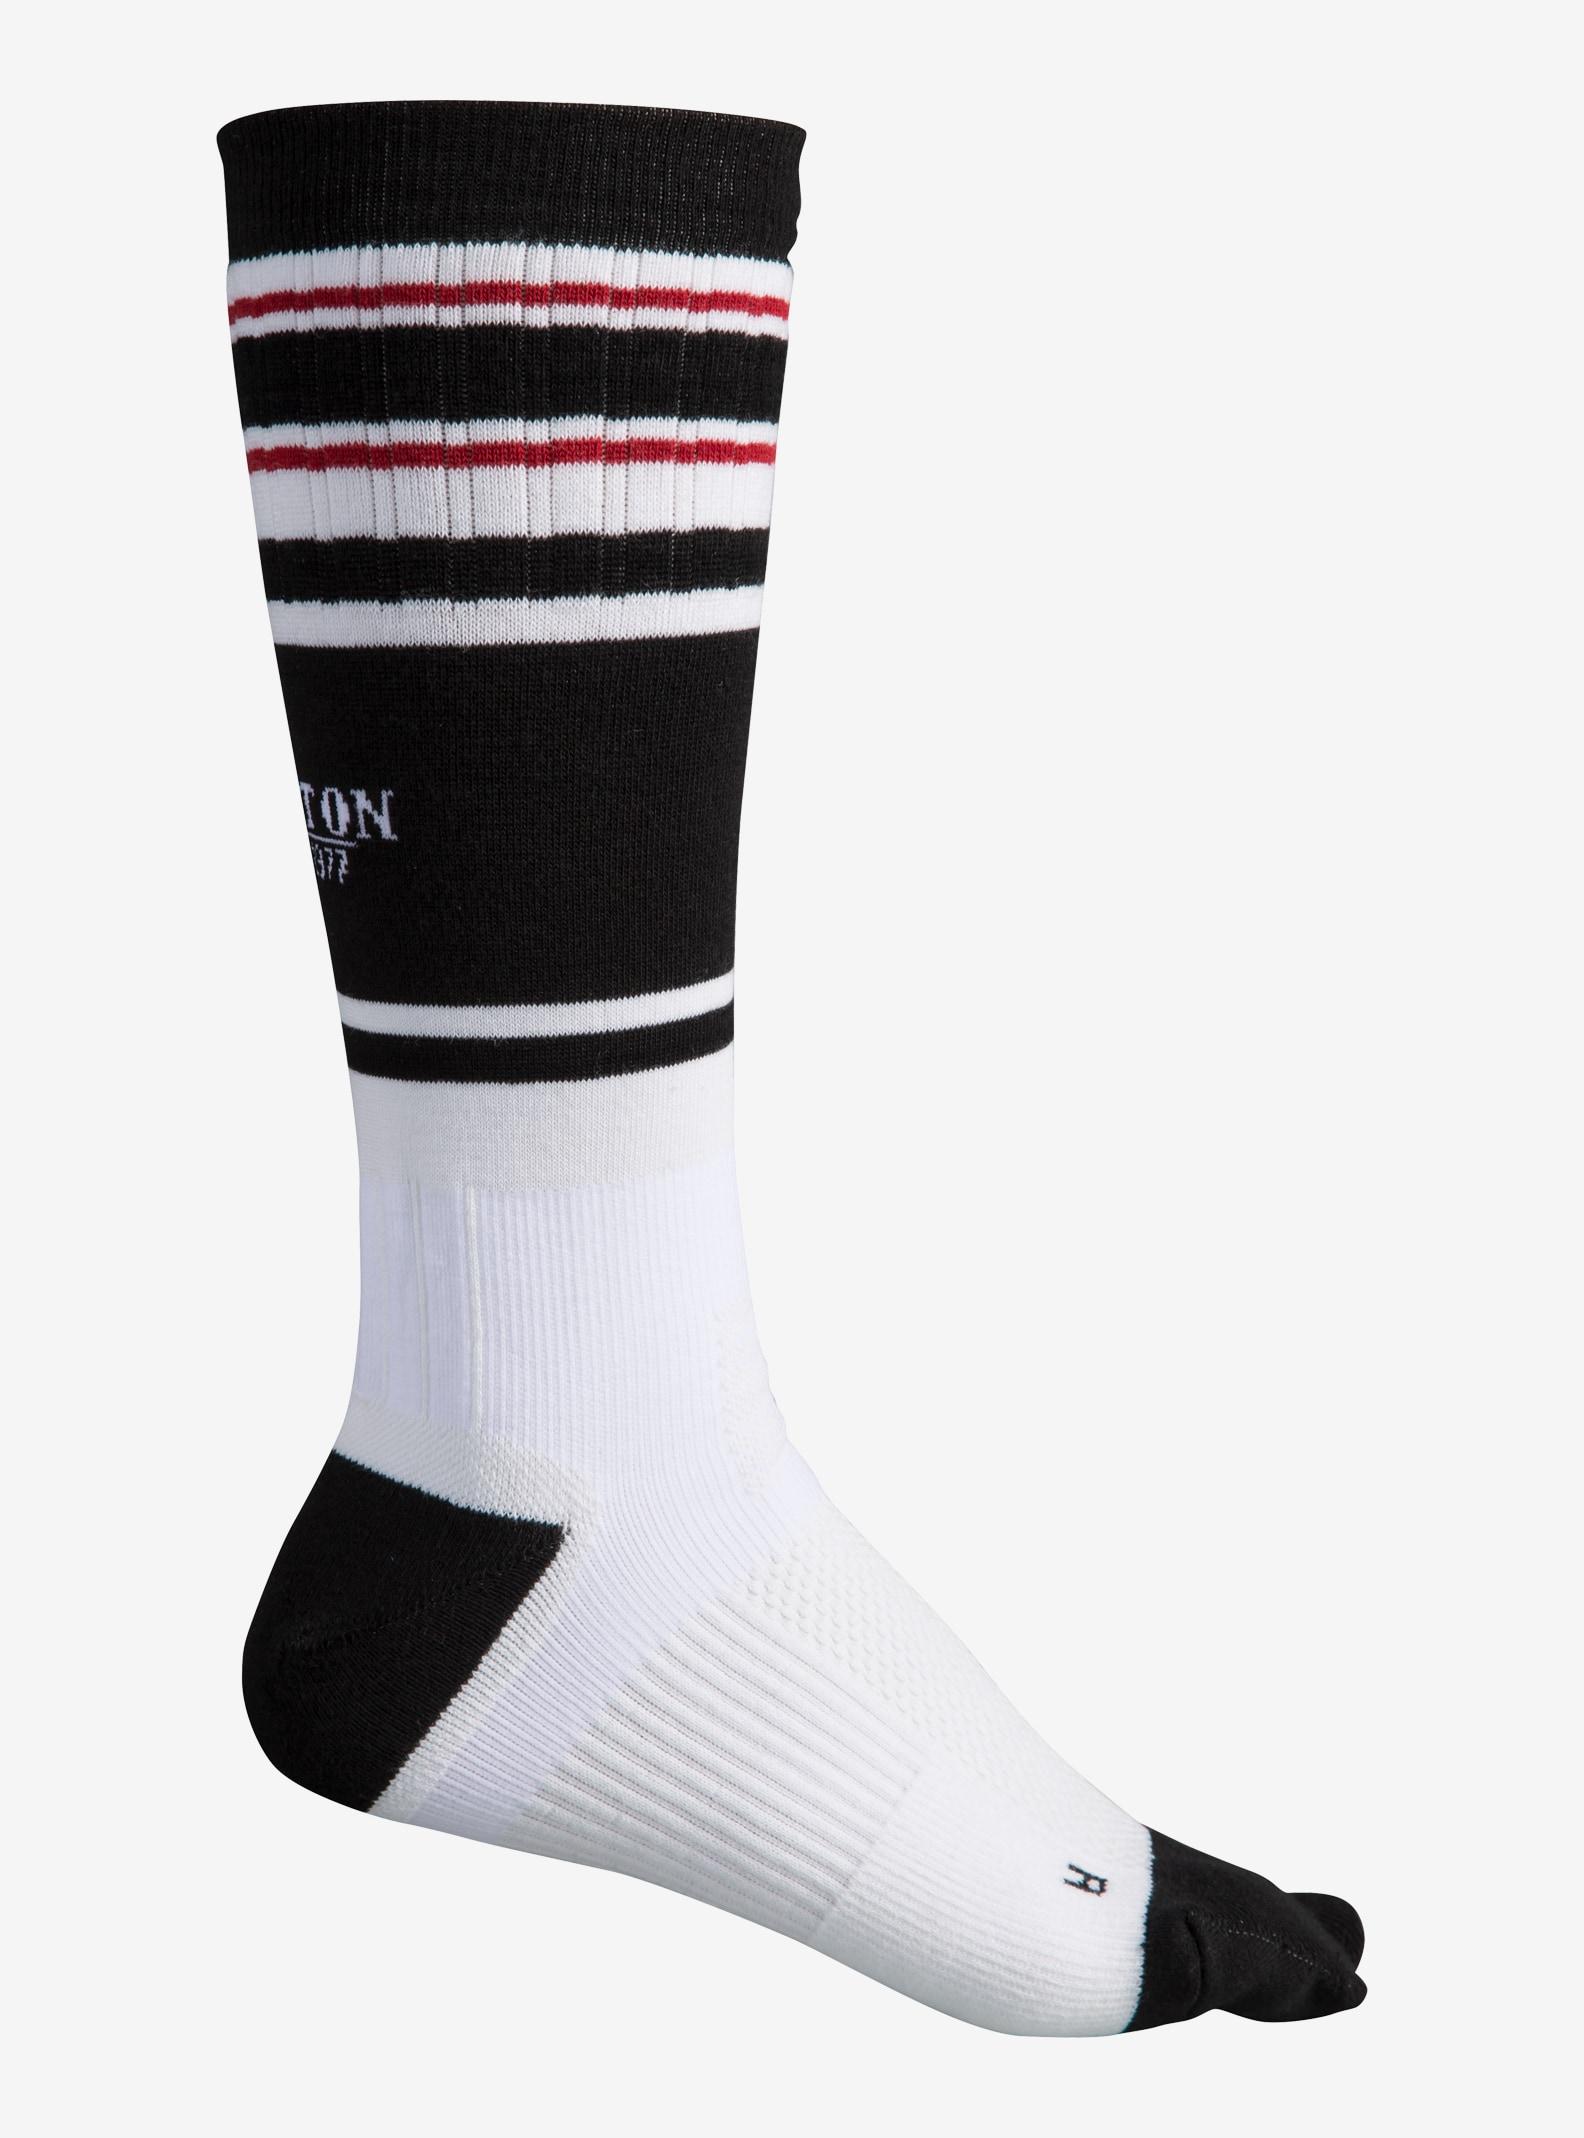 Burton Unsung Hero Sock shown in Black